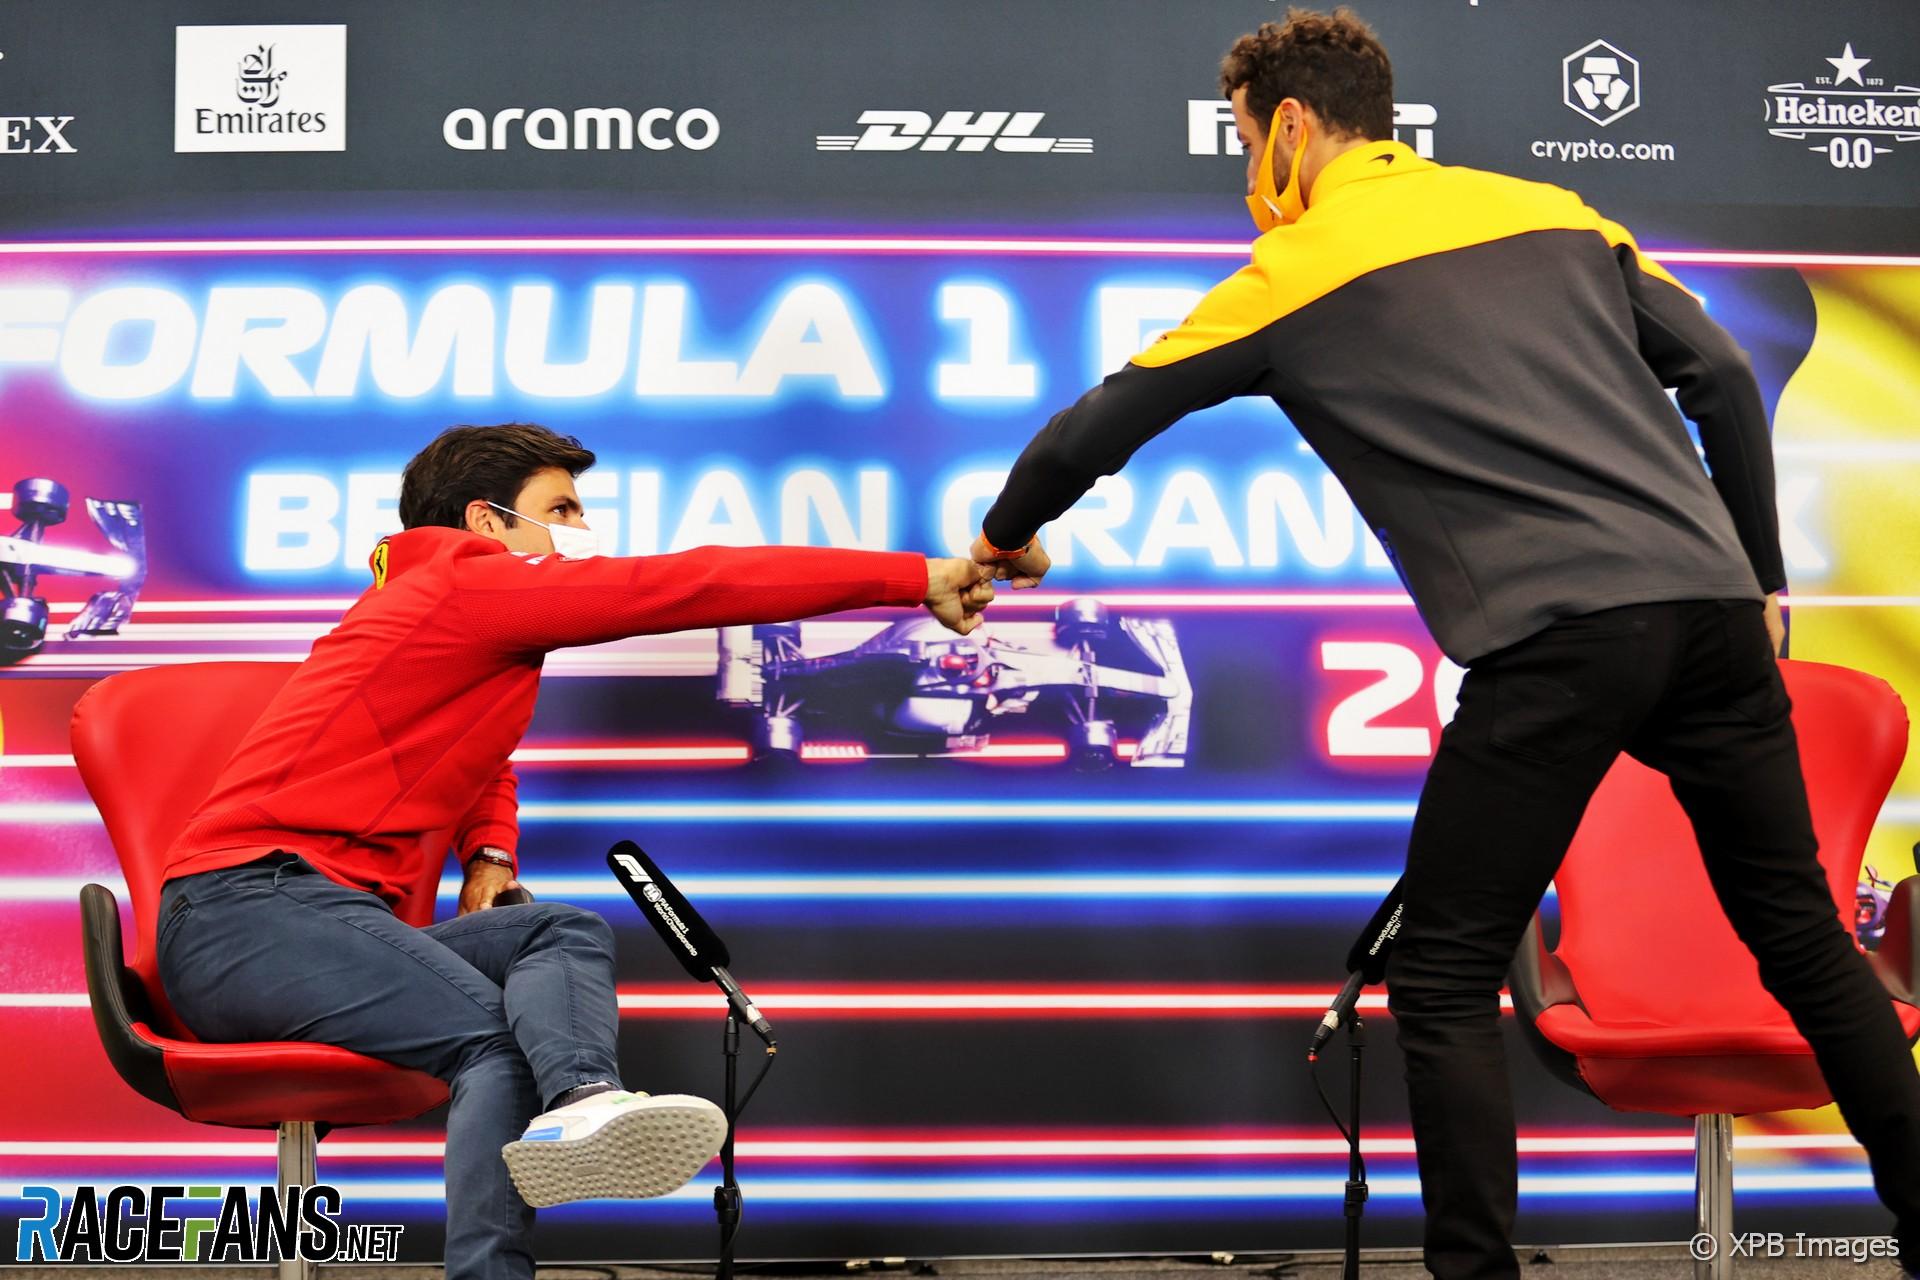 Carlos Sainz Jnr, Daniel Ricciardo, Spa-Francorchamps, 2021